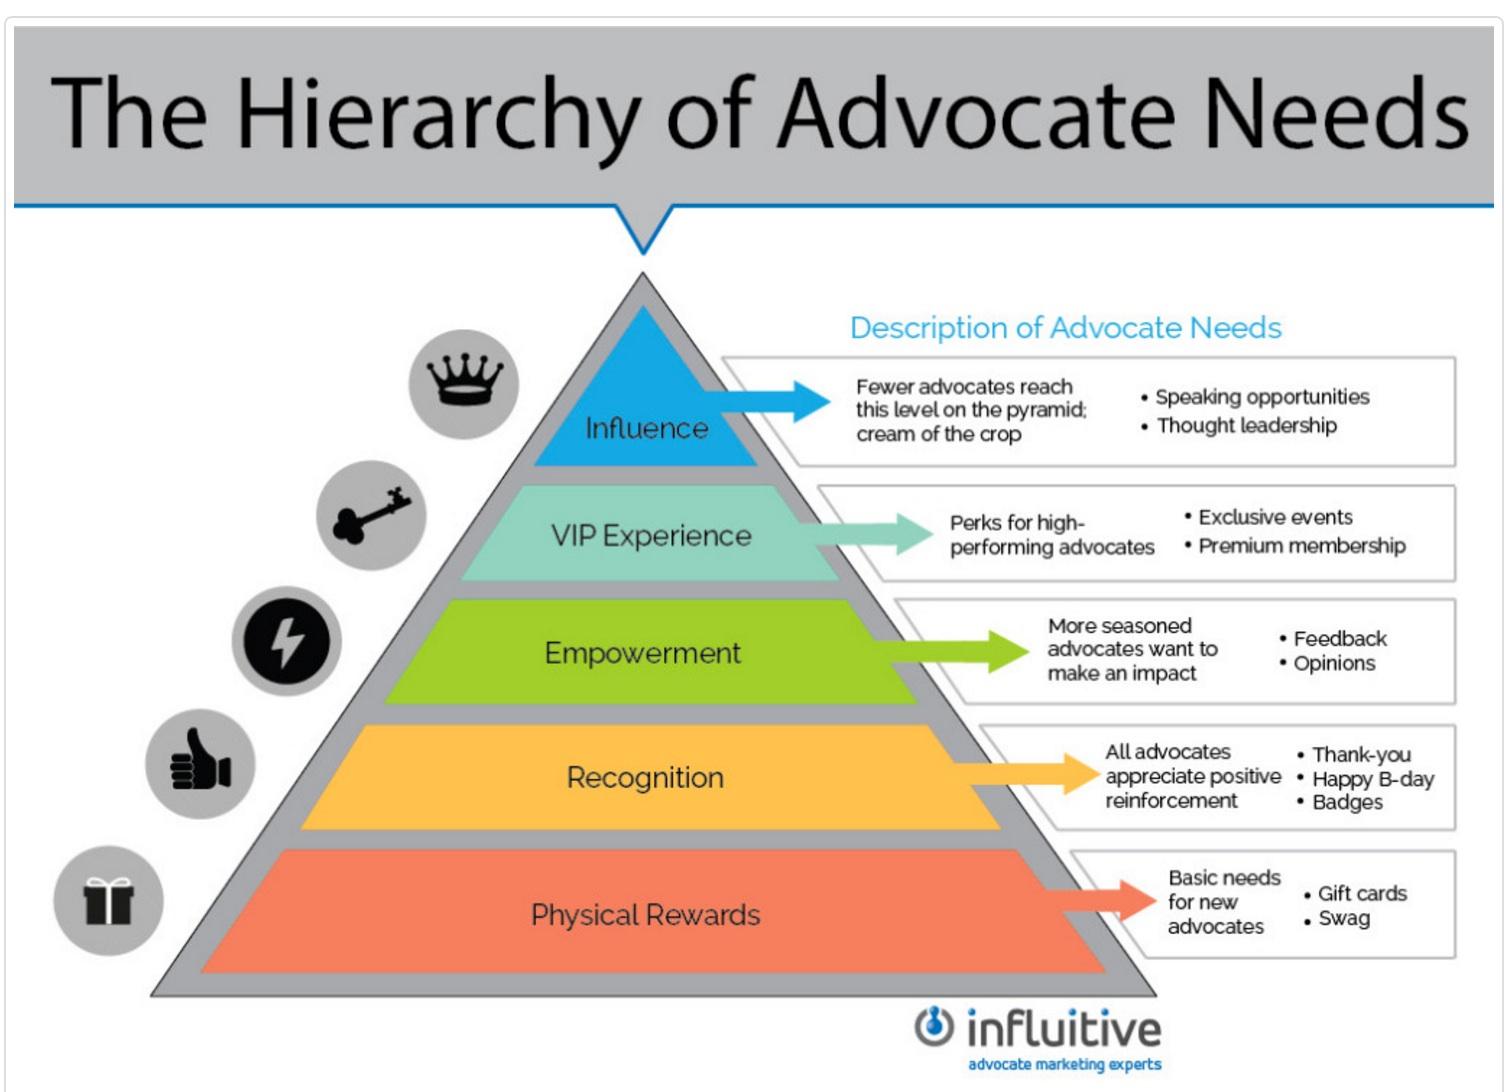 Pyramid highlighting five areas of advocate needs